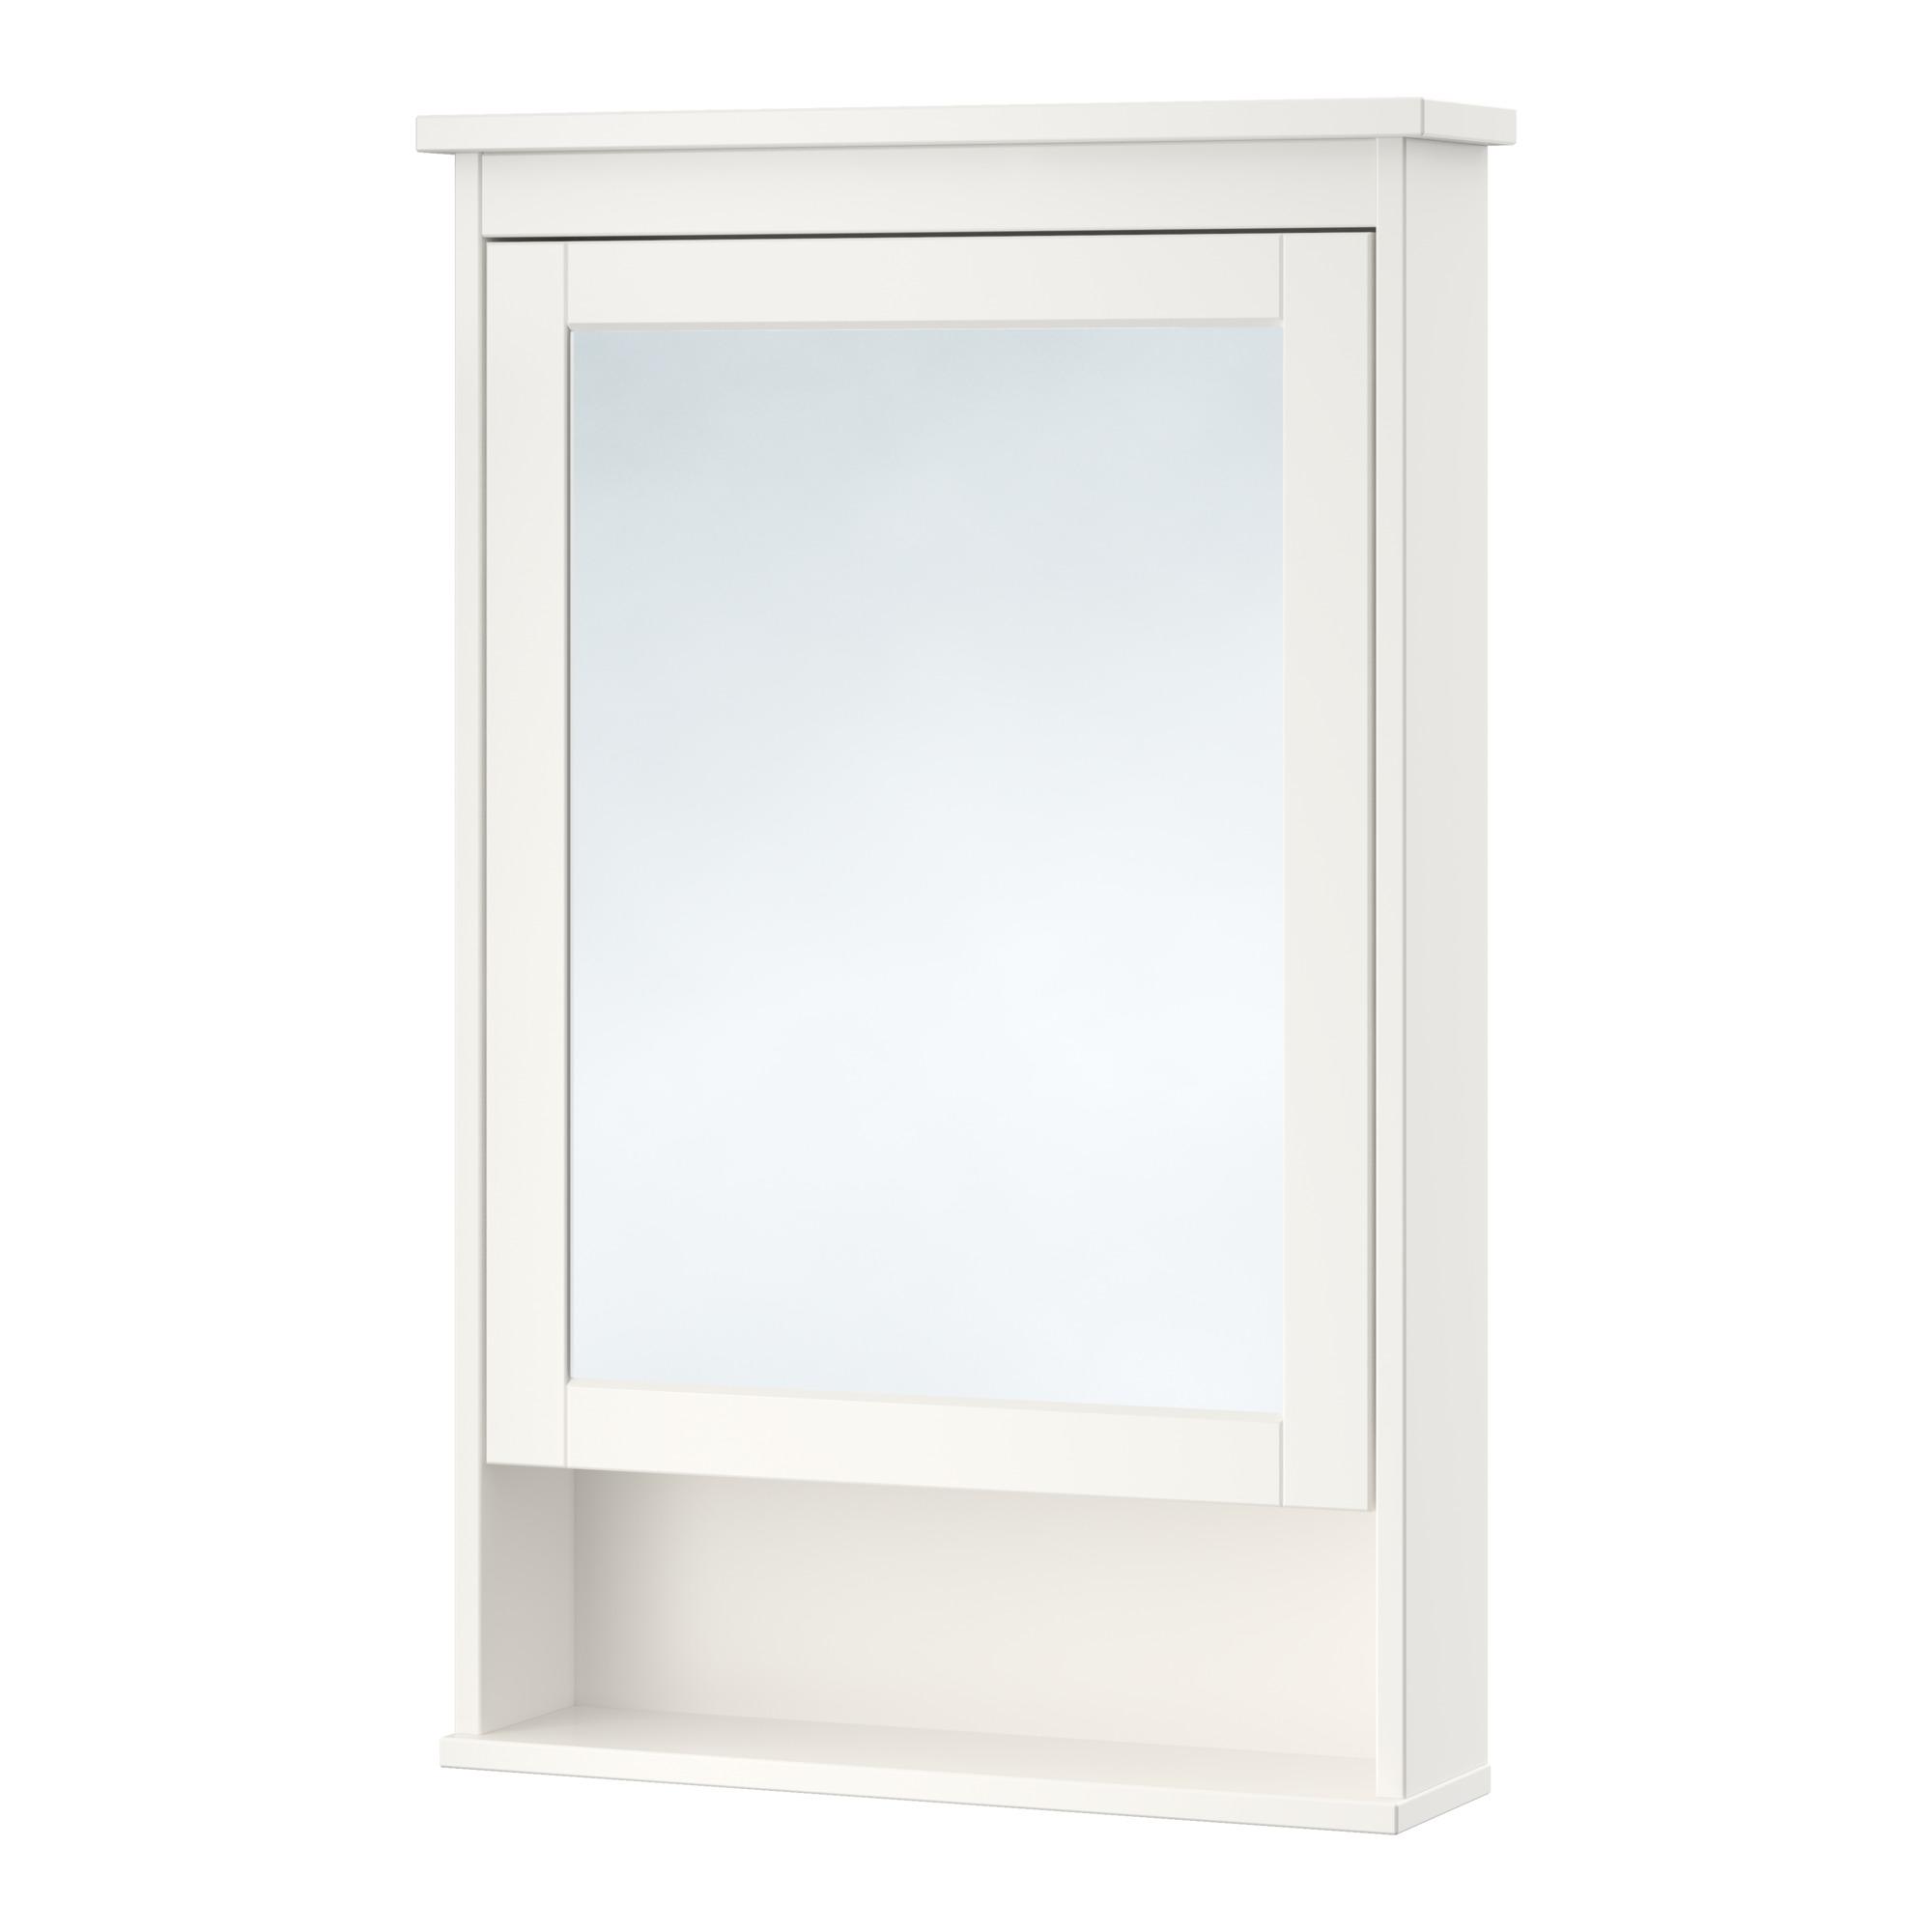 Hemnes Ikea Mirror Cabinets Komnit Furniture